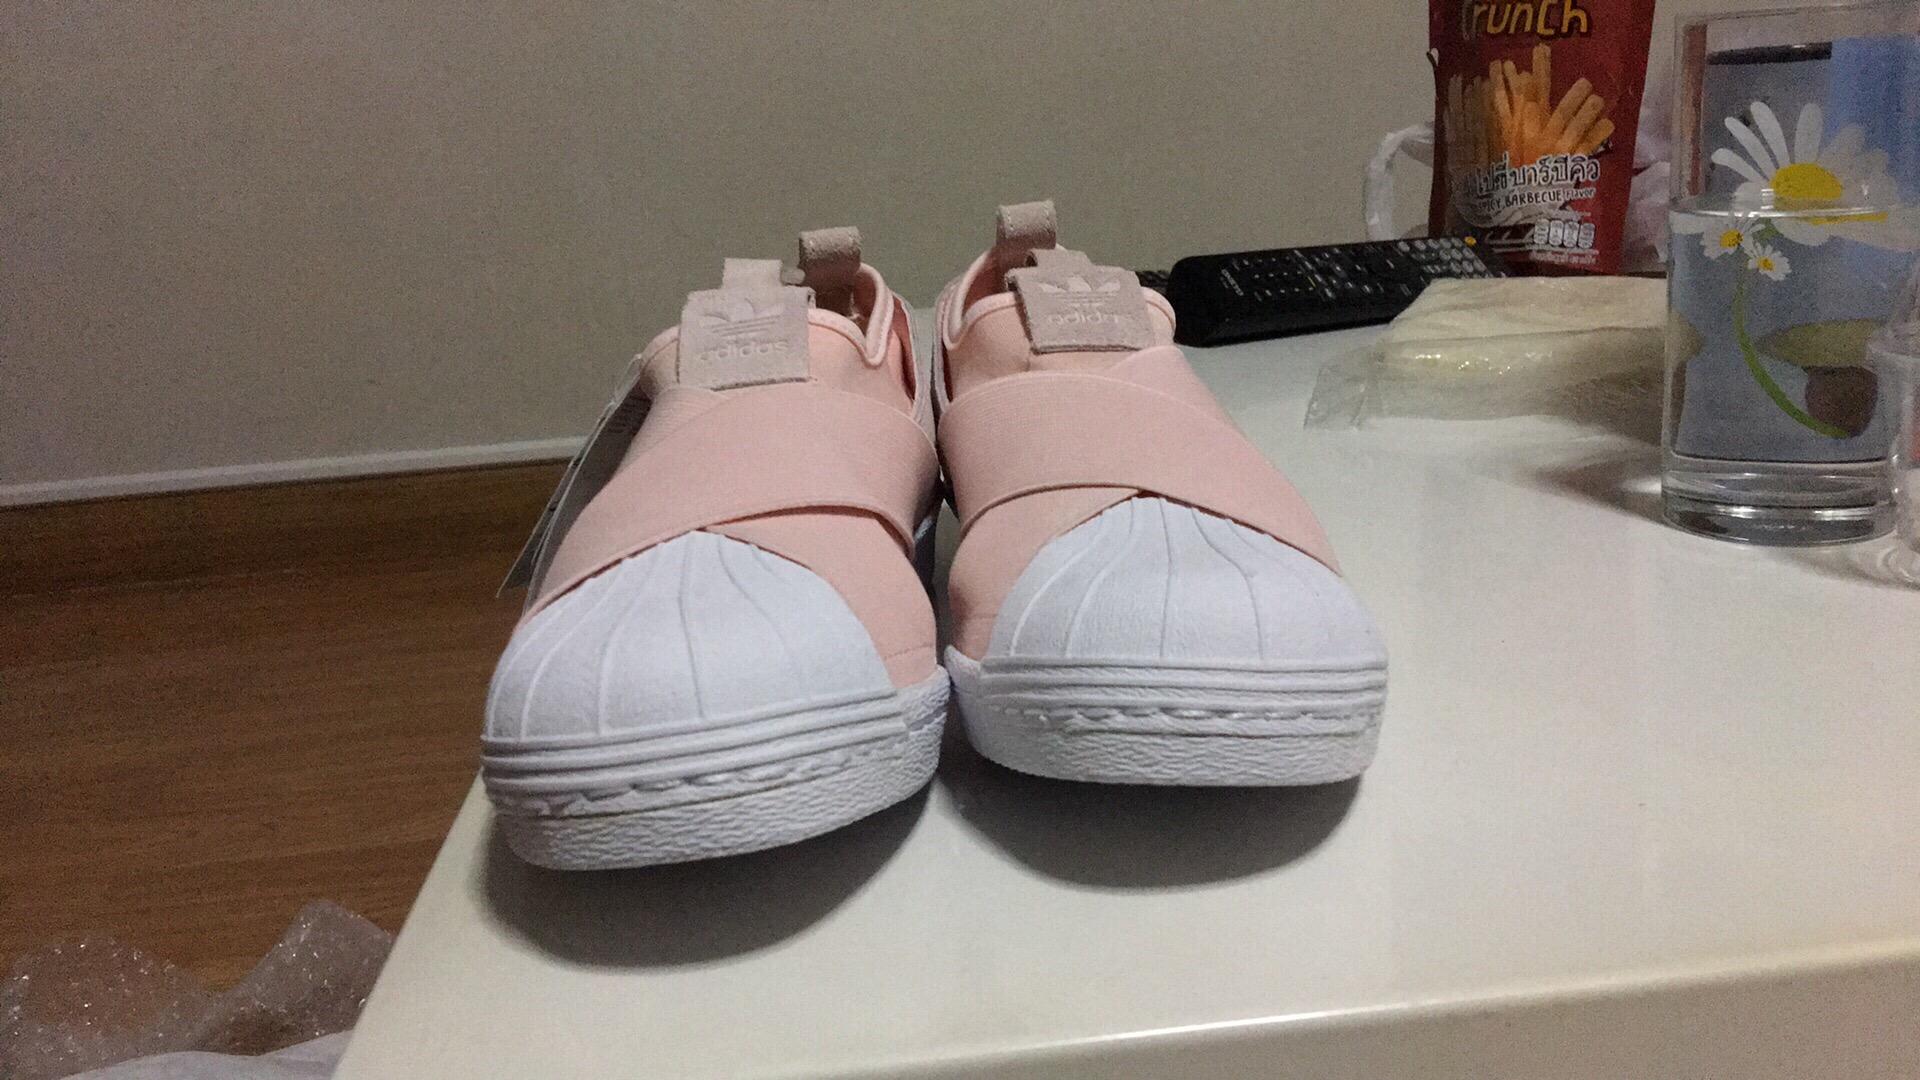 sneakers for cheap bd445 40505 Adidas Superstar Slip On รบกวนเพื่อนๆช่วยดูให้หน่อยครับ ว่า ...